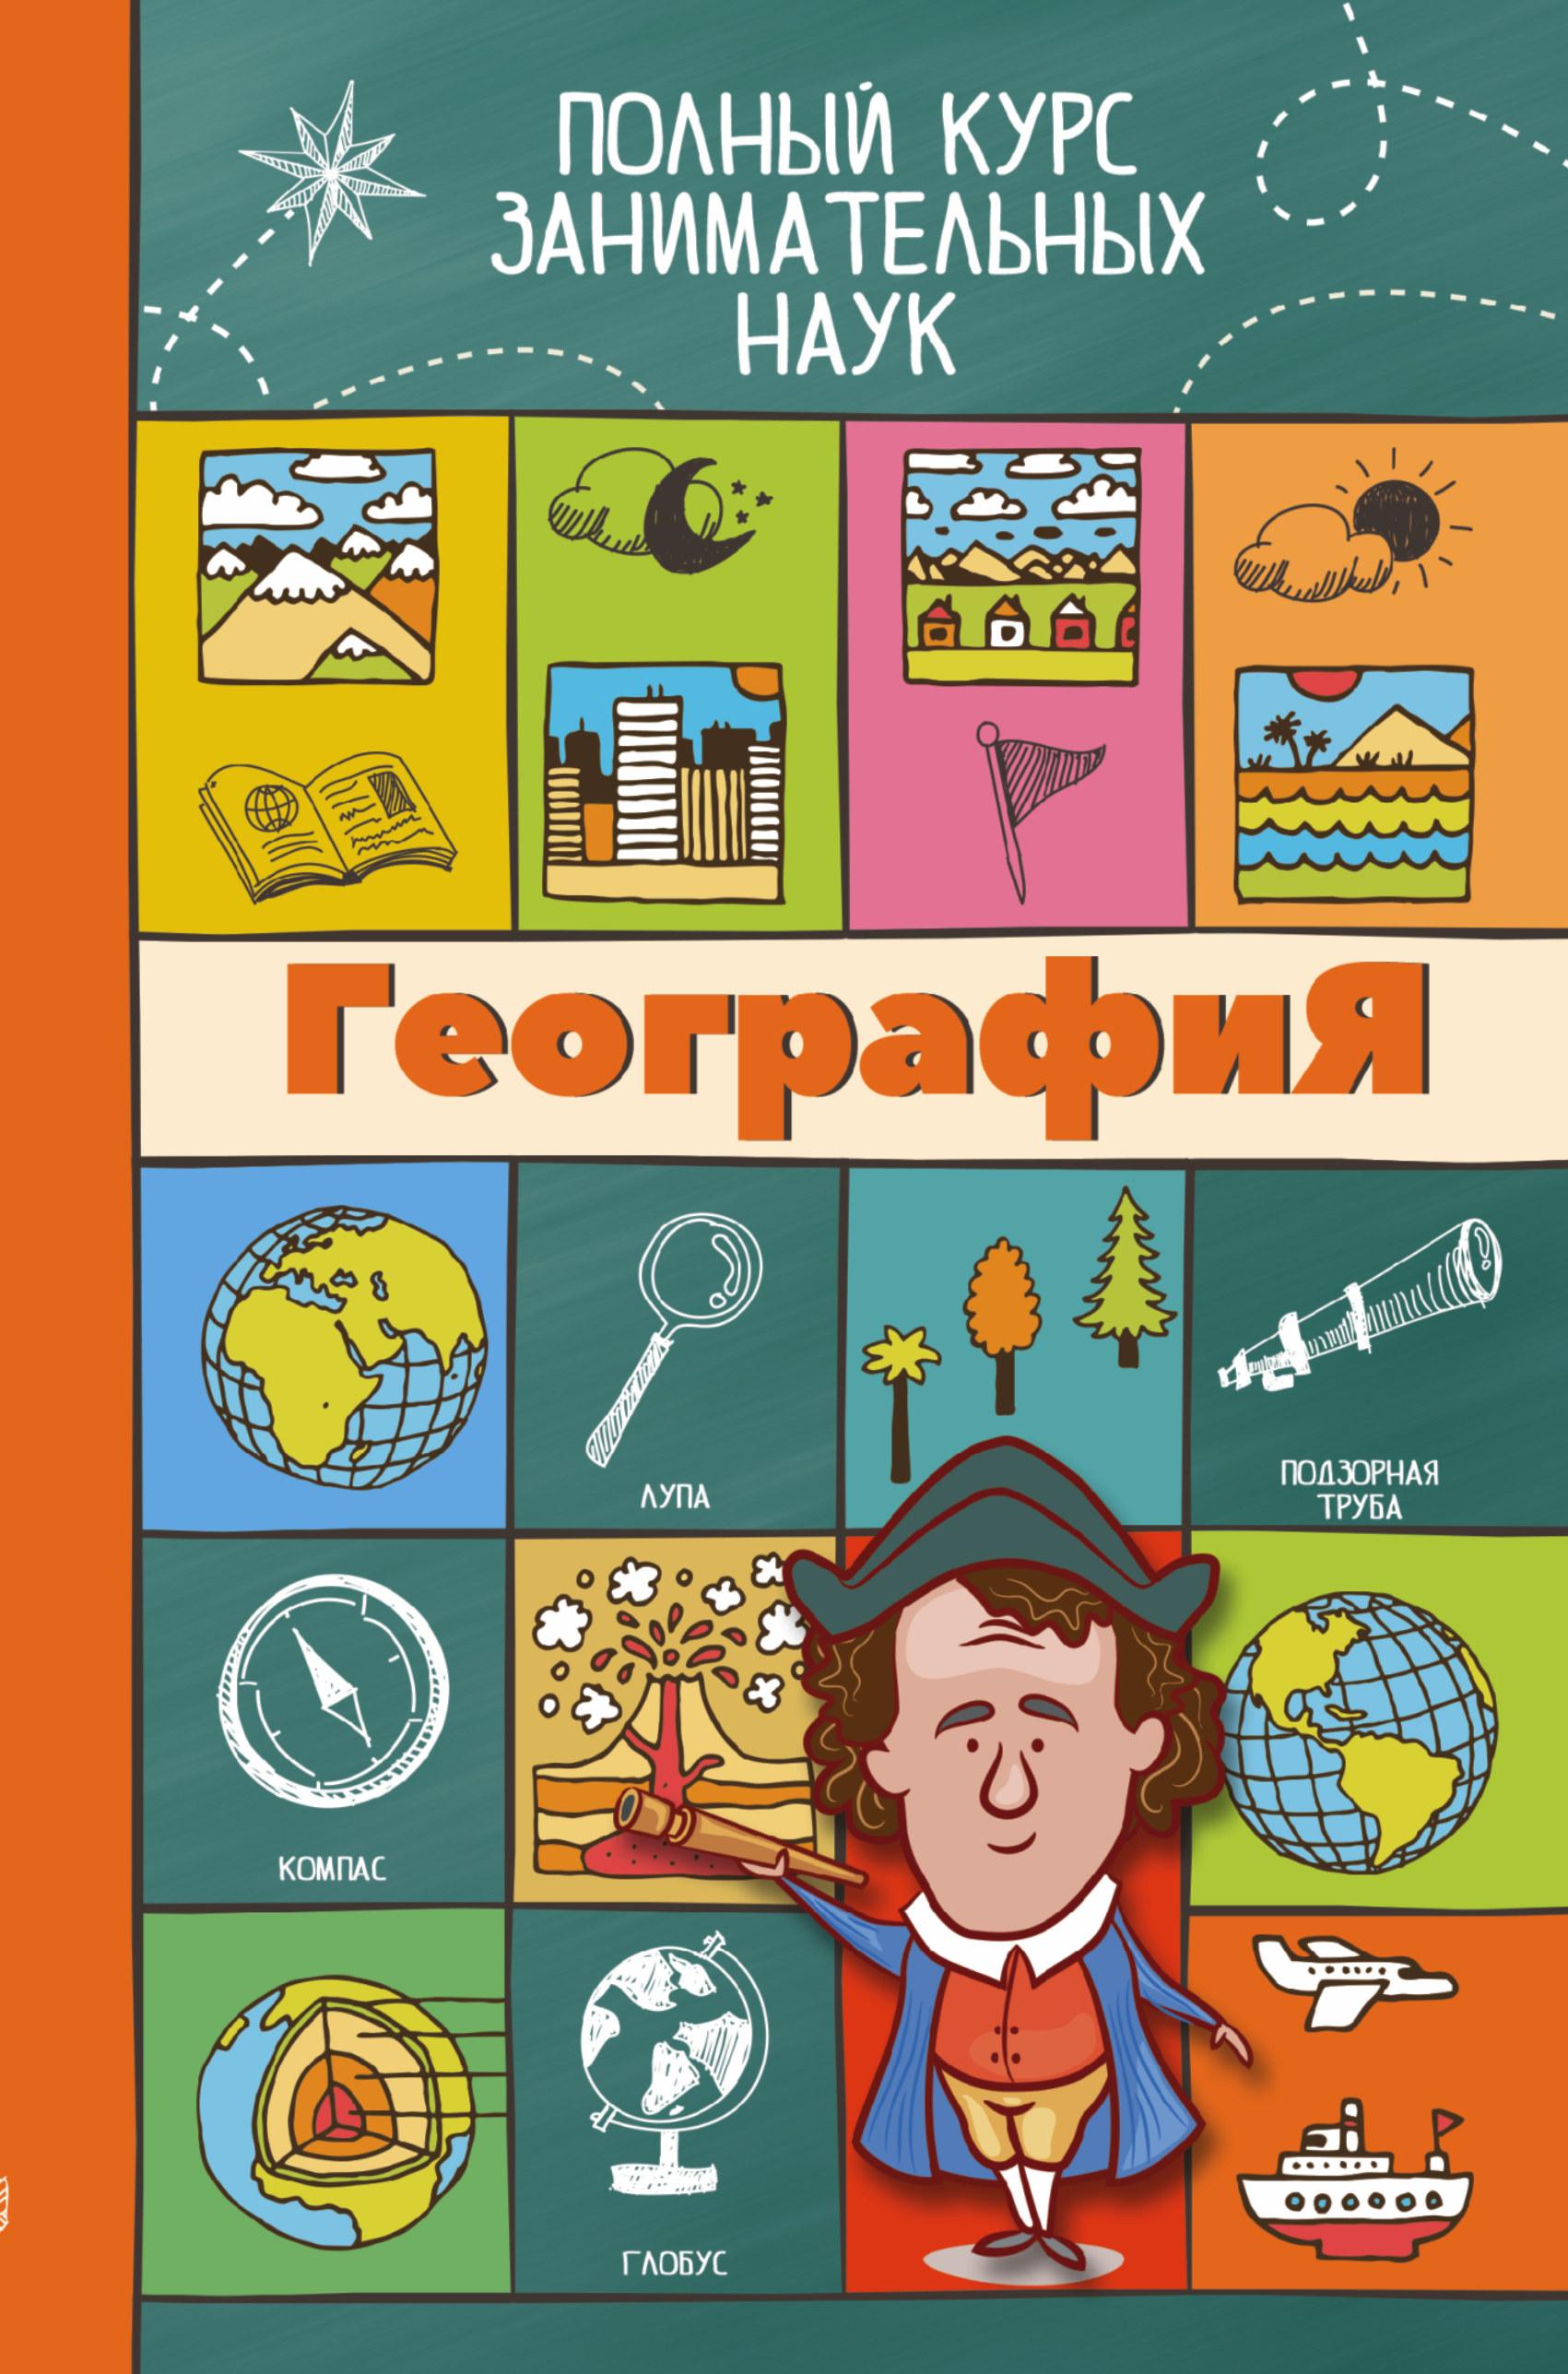 География от book24.ru